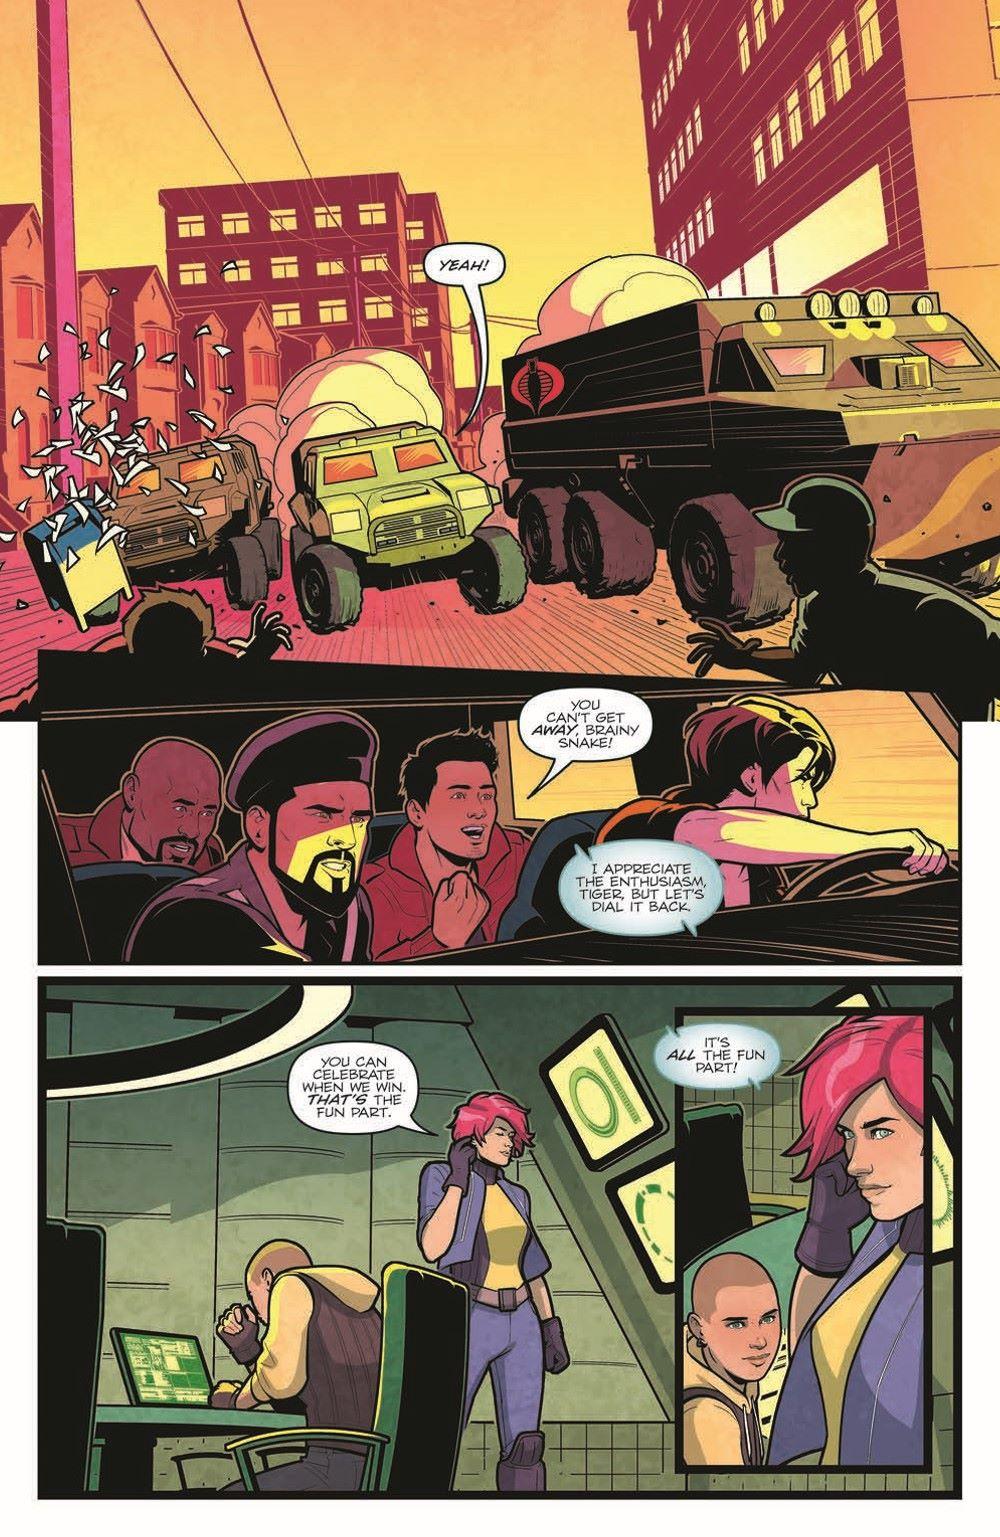 GIJoe_CastleFall-pr-4 ComicList Previews: G.I. JOE CASTLE FALL #1